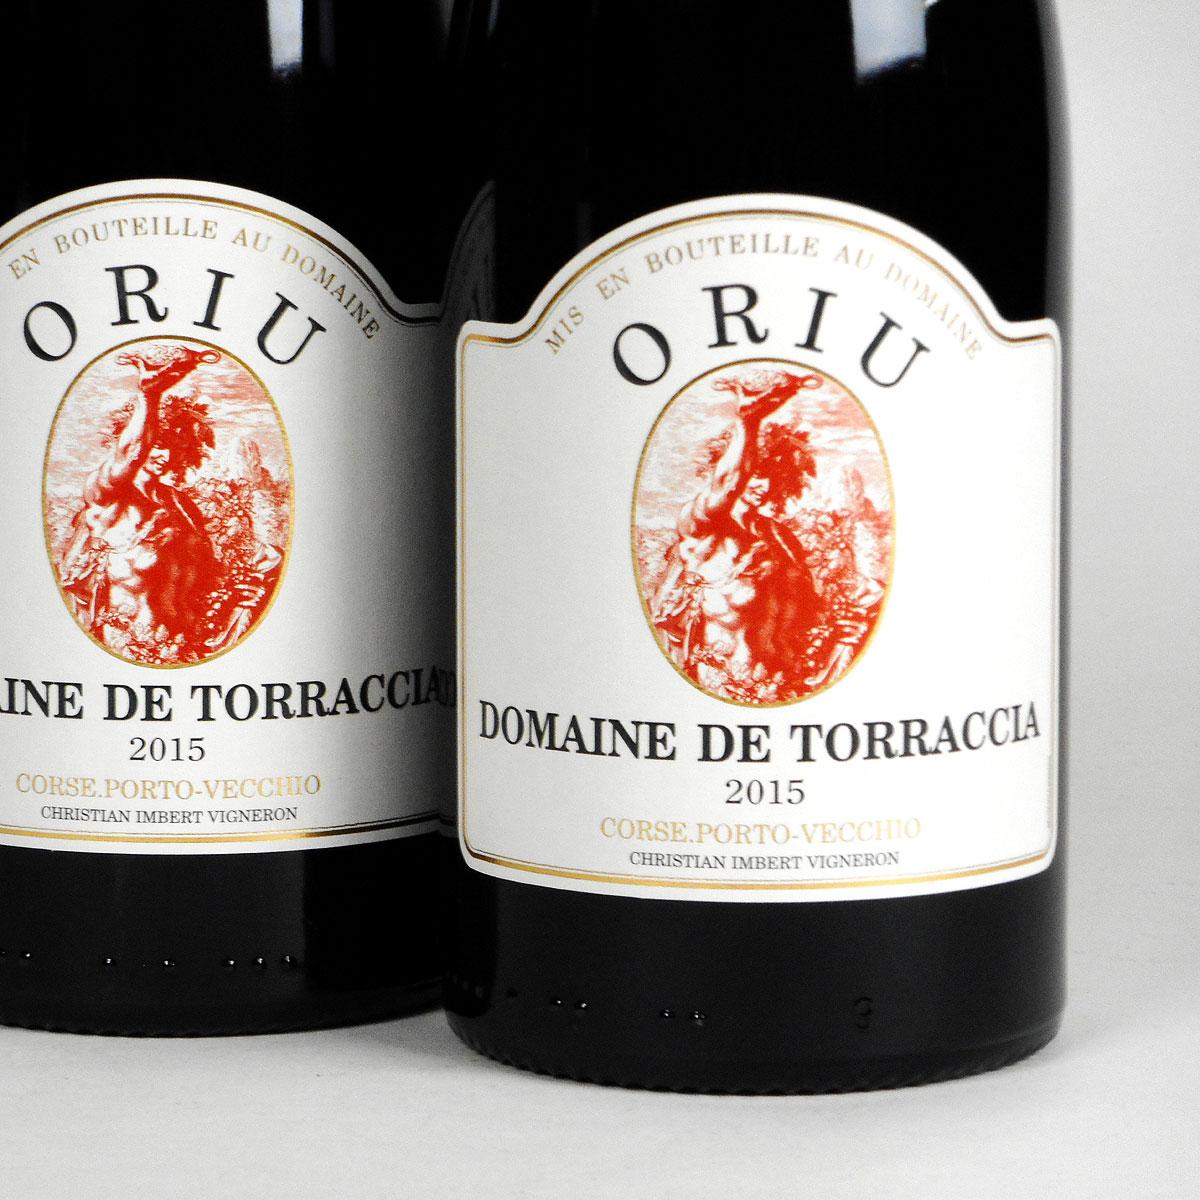 Vin de Corse Porto Vecchio: Domaine de Torraccia: Cuvée Oriu 2015